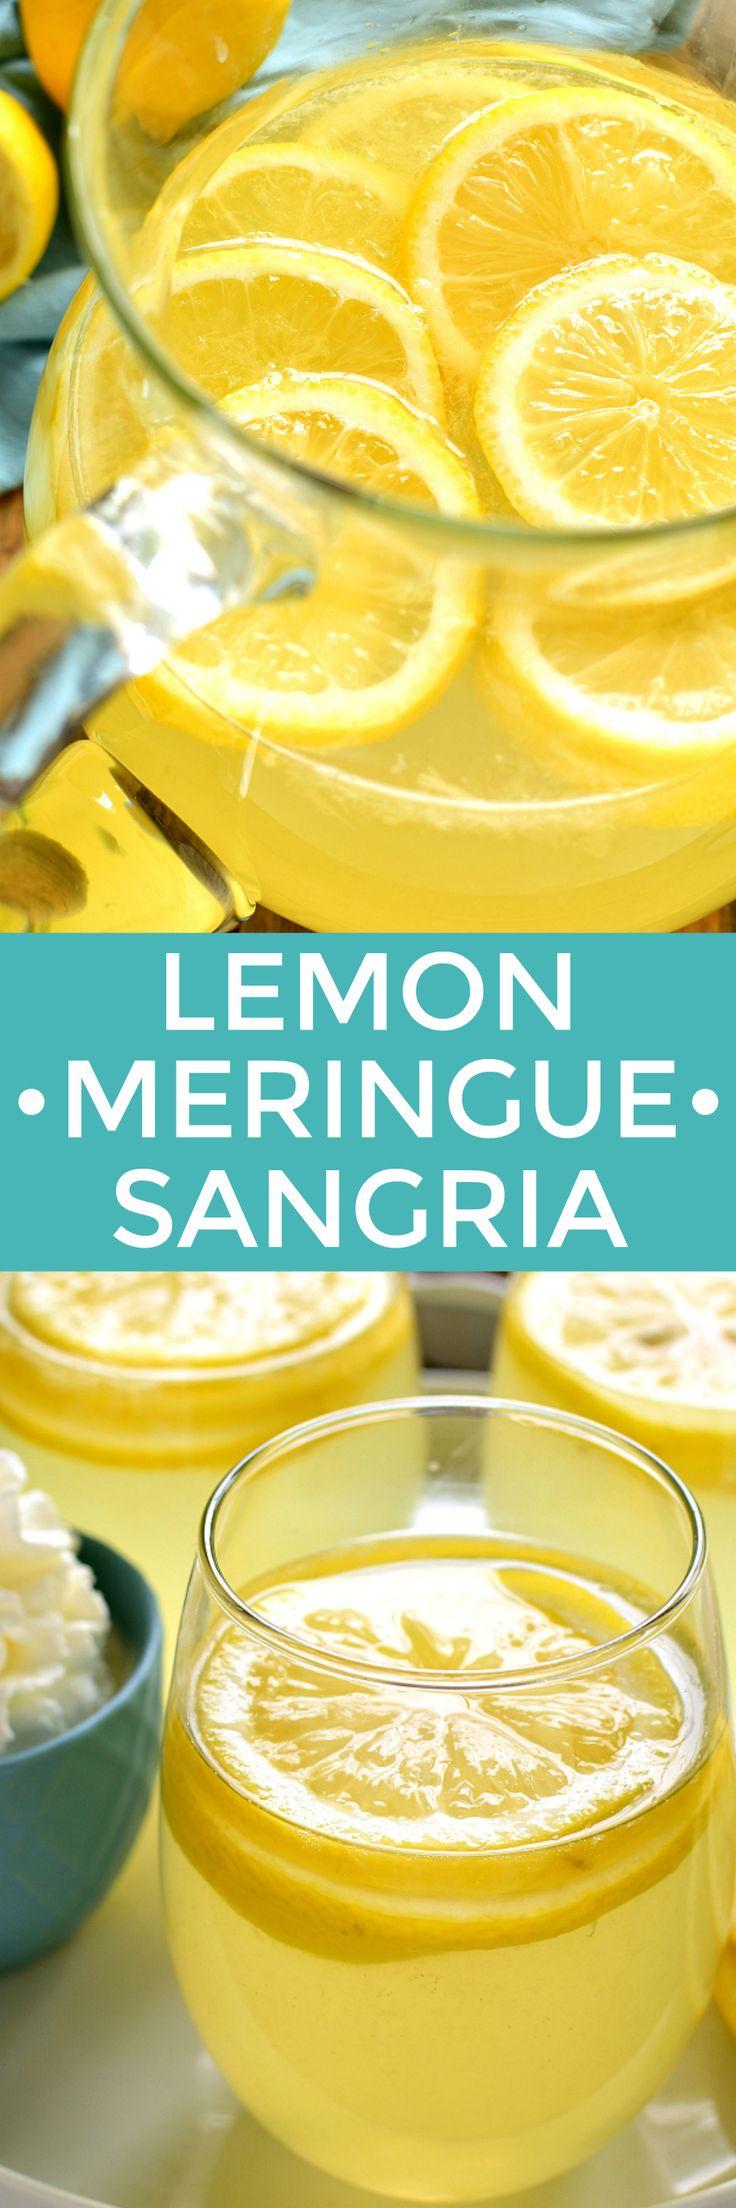 This Lemon Meringue Sangria tastes just like Lemon Meringue Pie...in a glass! The perfect way to welcome in spring!